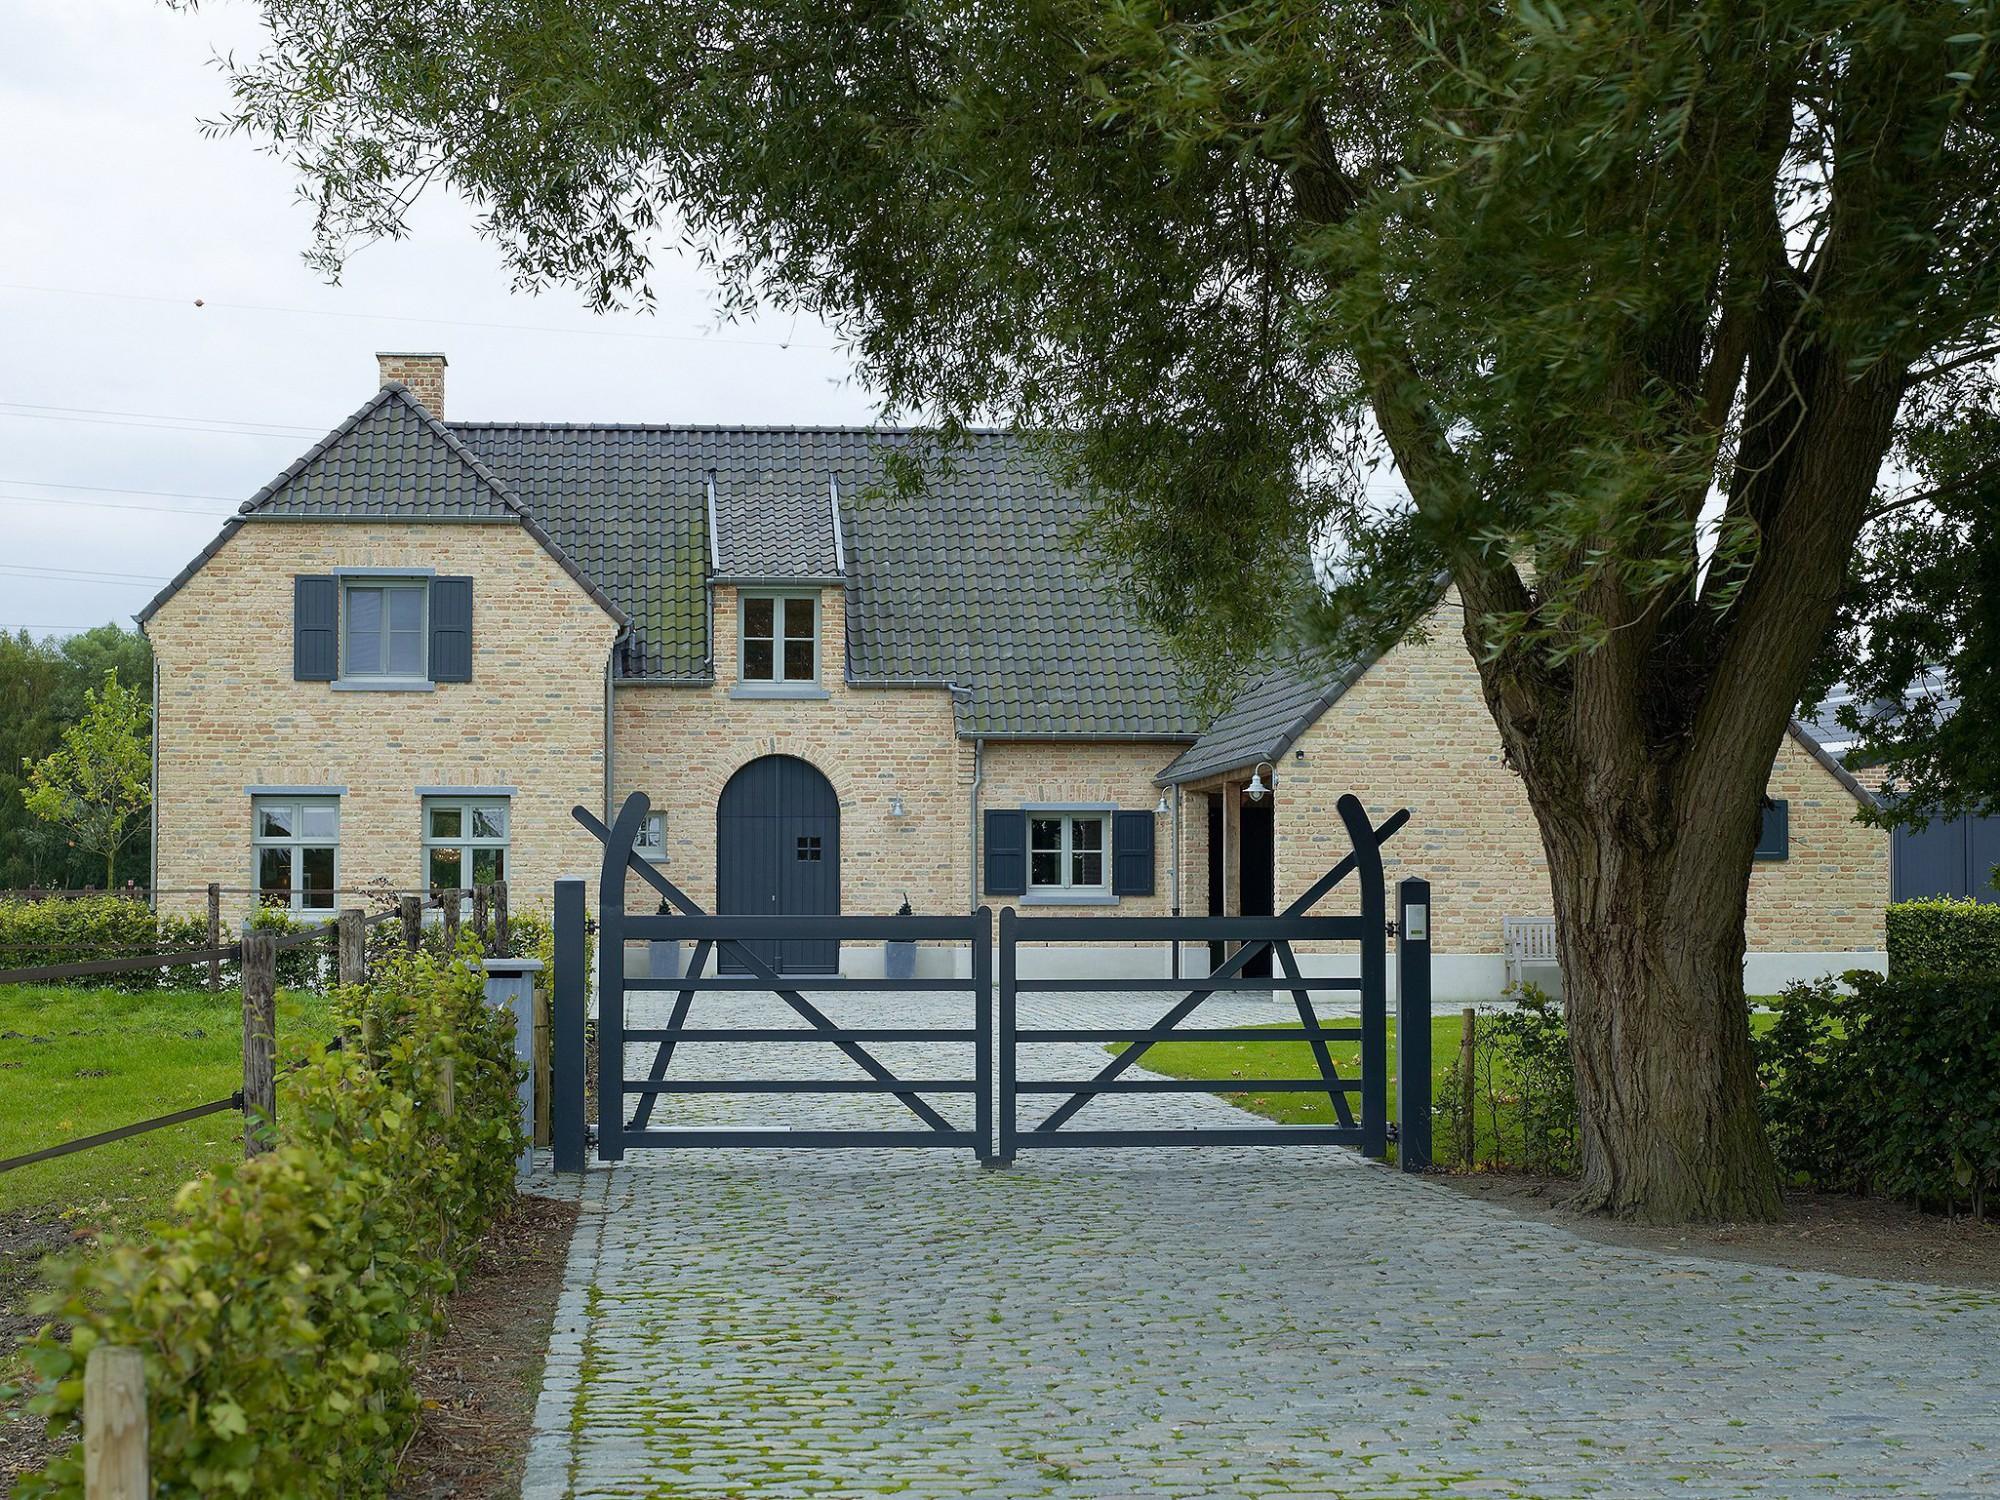 Afbeelding: Architectuur fotografie woningen Foto Van Huffel, klassieke woning, voor bouwonderneming RDK.